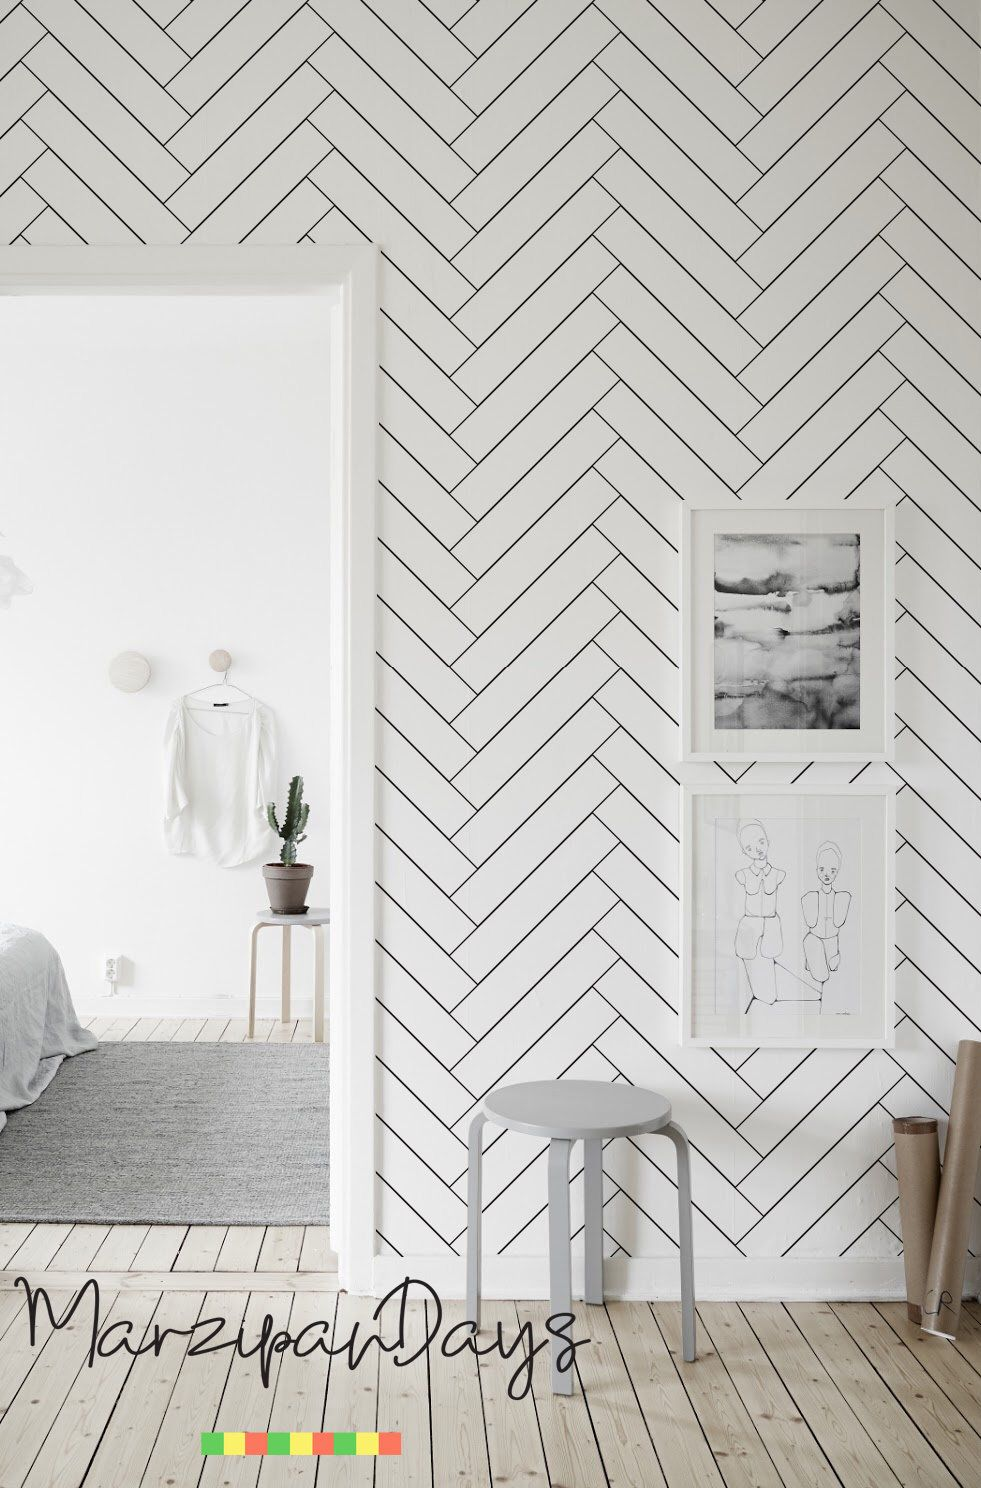 Herringbone Pattern Wallpaper Black And White Minimalist Wallpaper Removable Wall Mural Pattern Self Adhesive Or Traditional 40 Bathroom Wallpaper Trends Minimalist Wallpaper Herringbone Wallpaper